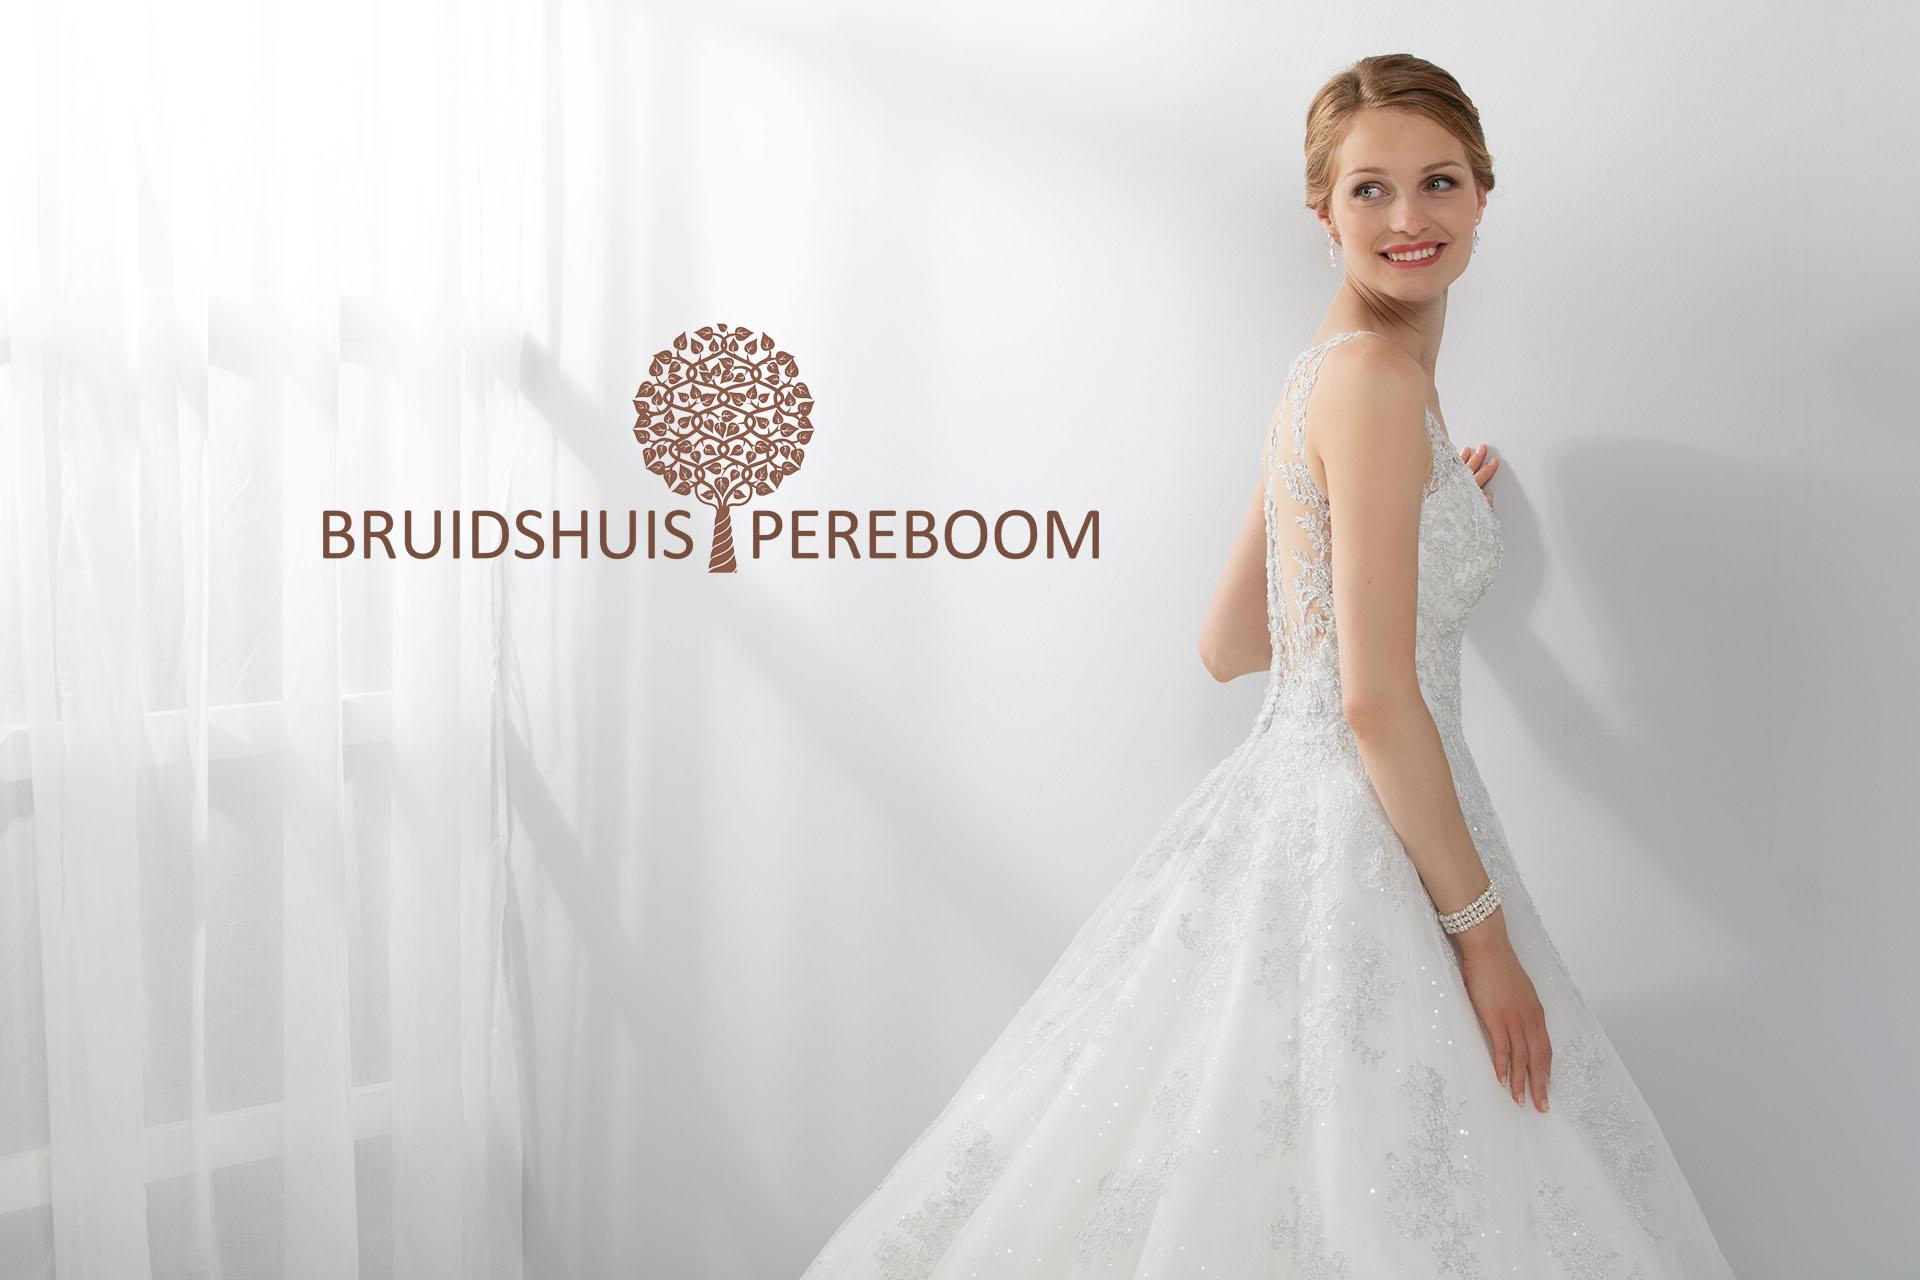 Bruidsjurken Limburg.Home Bruidshuis Pereboom